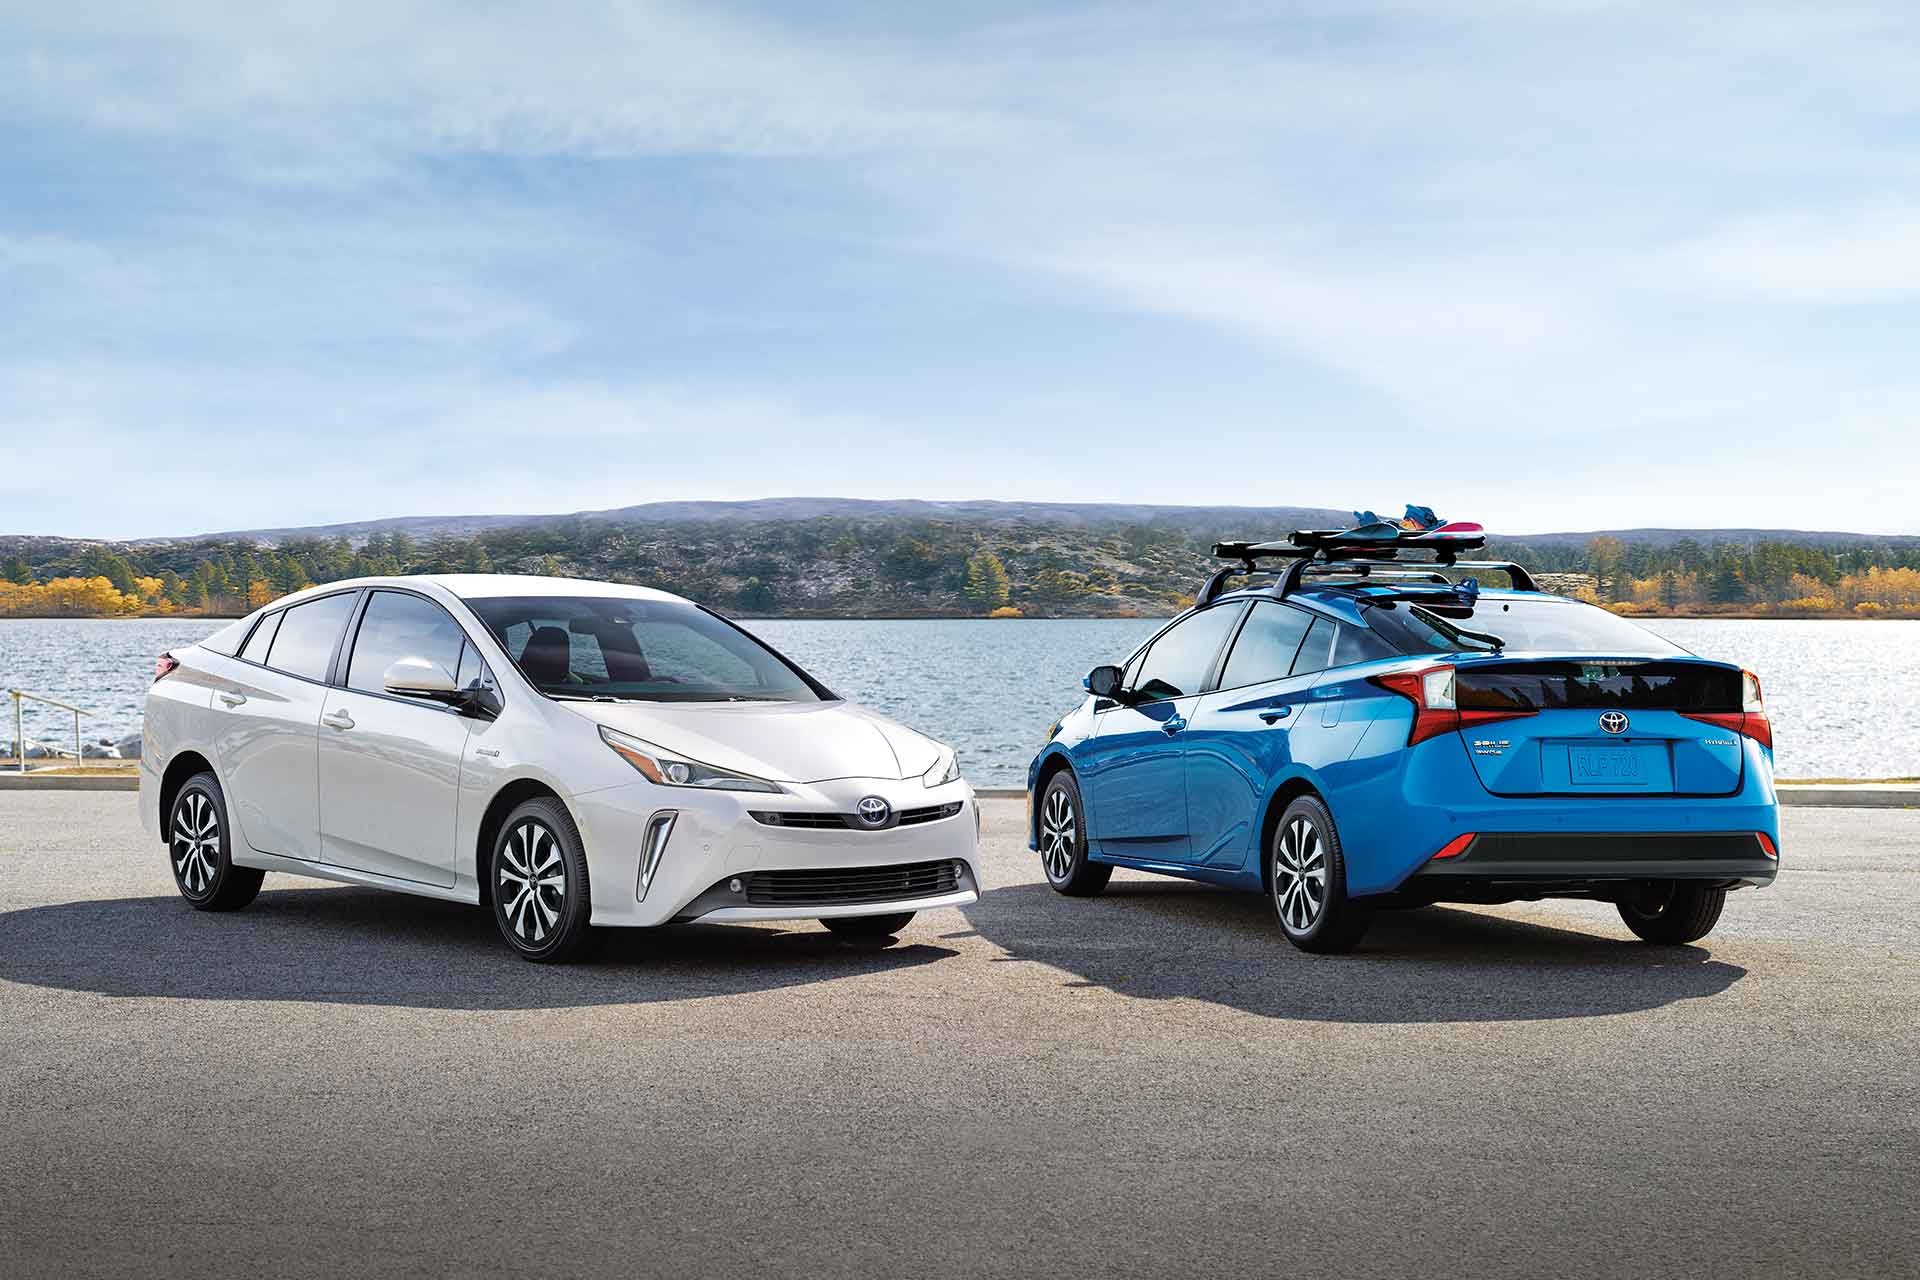 2019 Toyota Prius For Sale in Toronto | Pickering Toyota